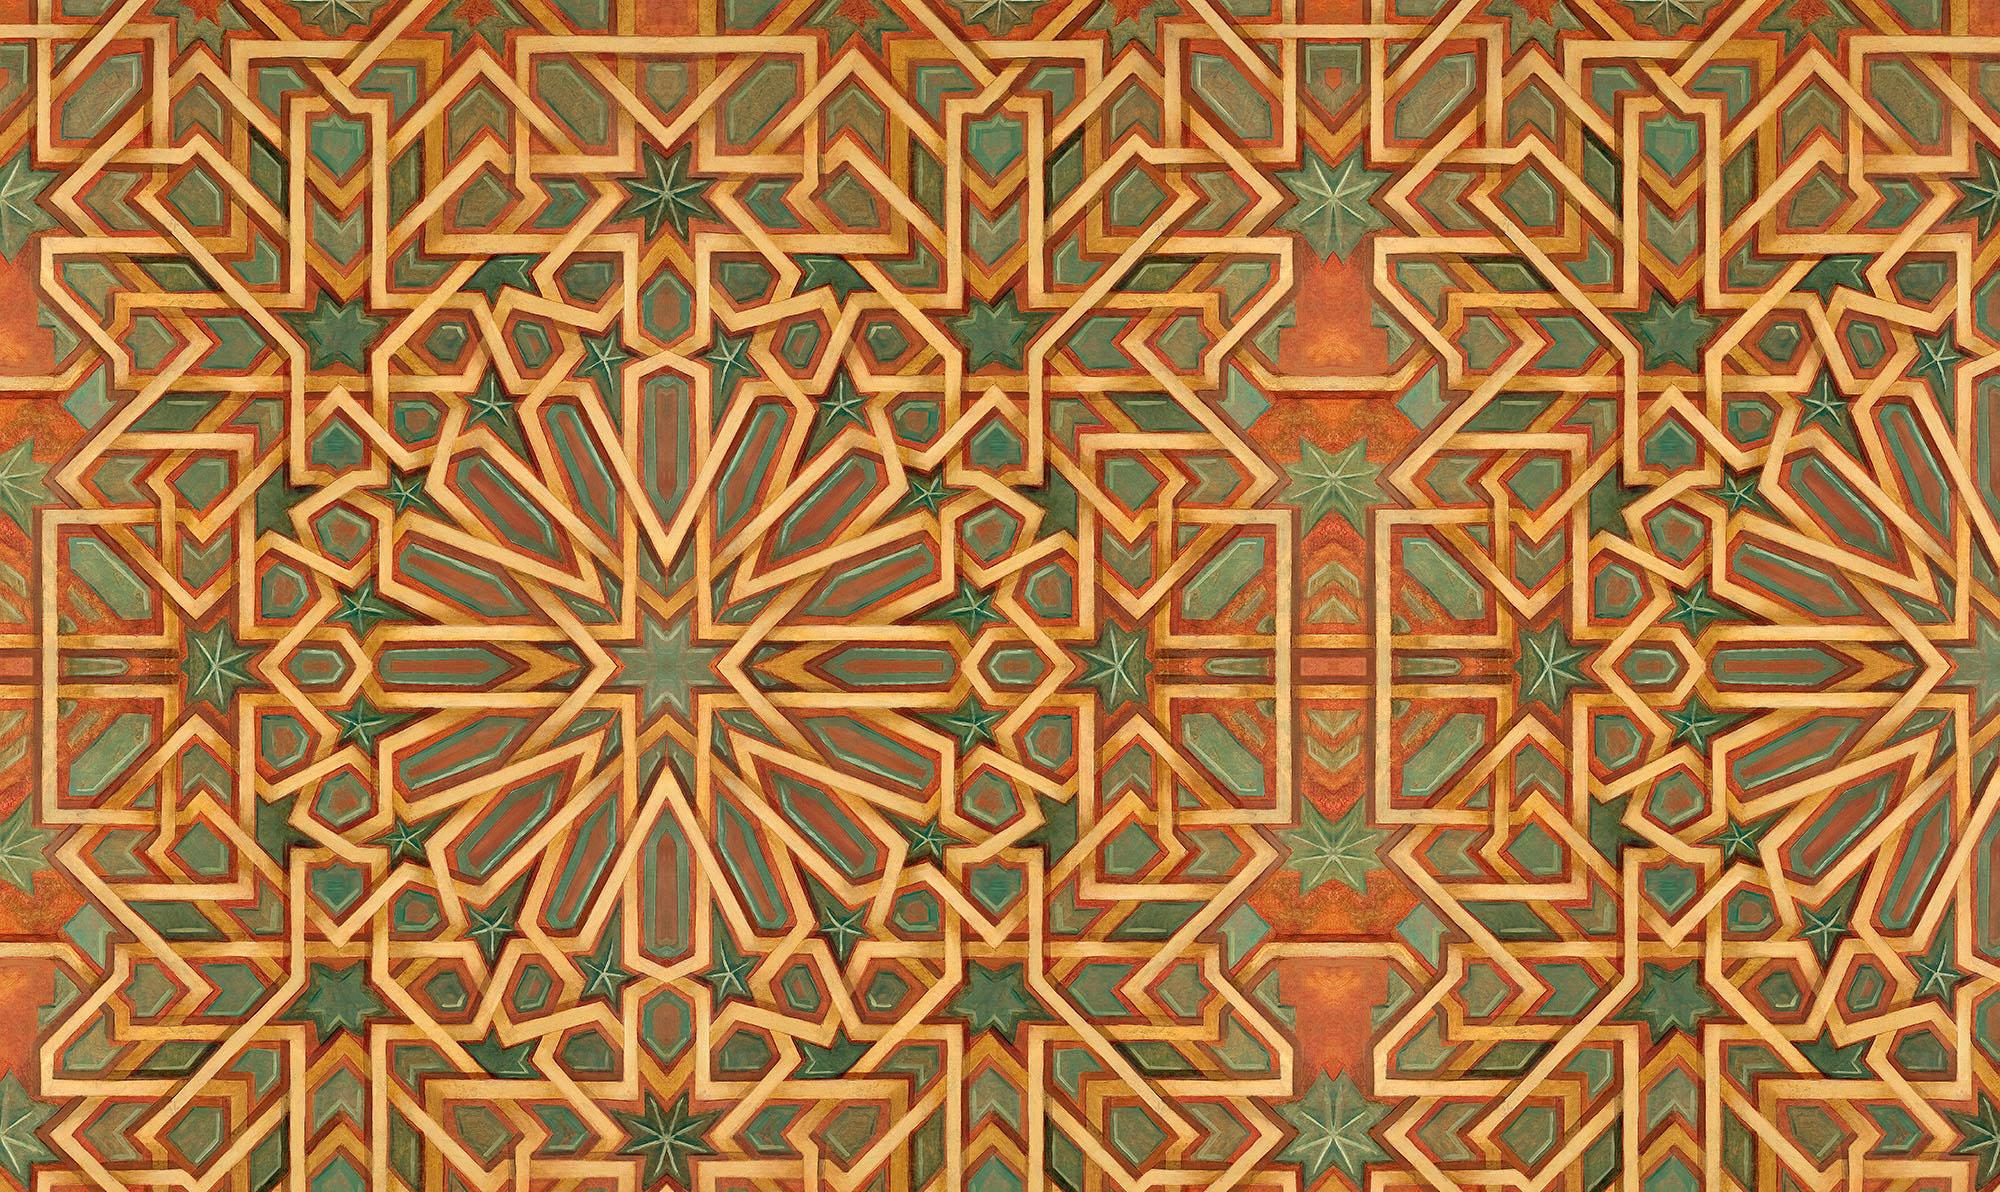 Living Room Top Moroccan Style Design Home Interior Tiles Stencil ...